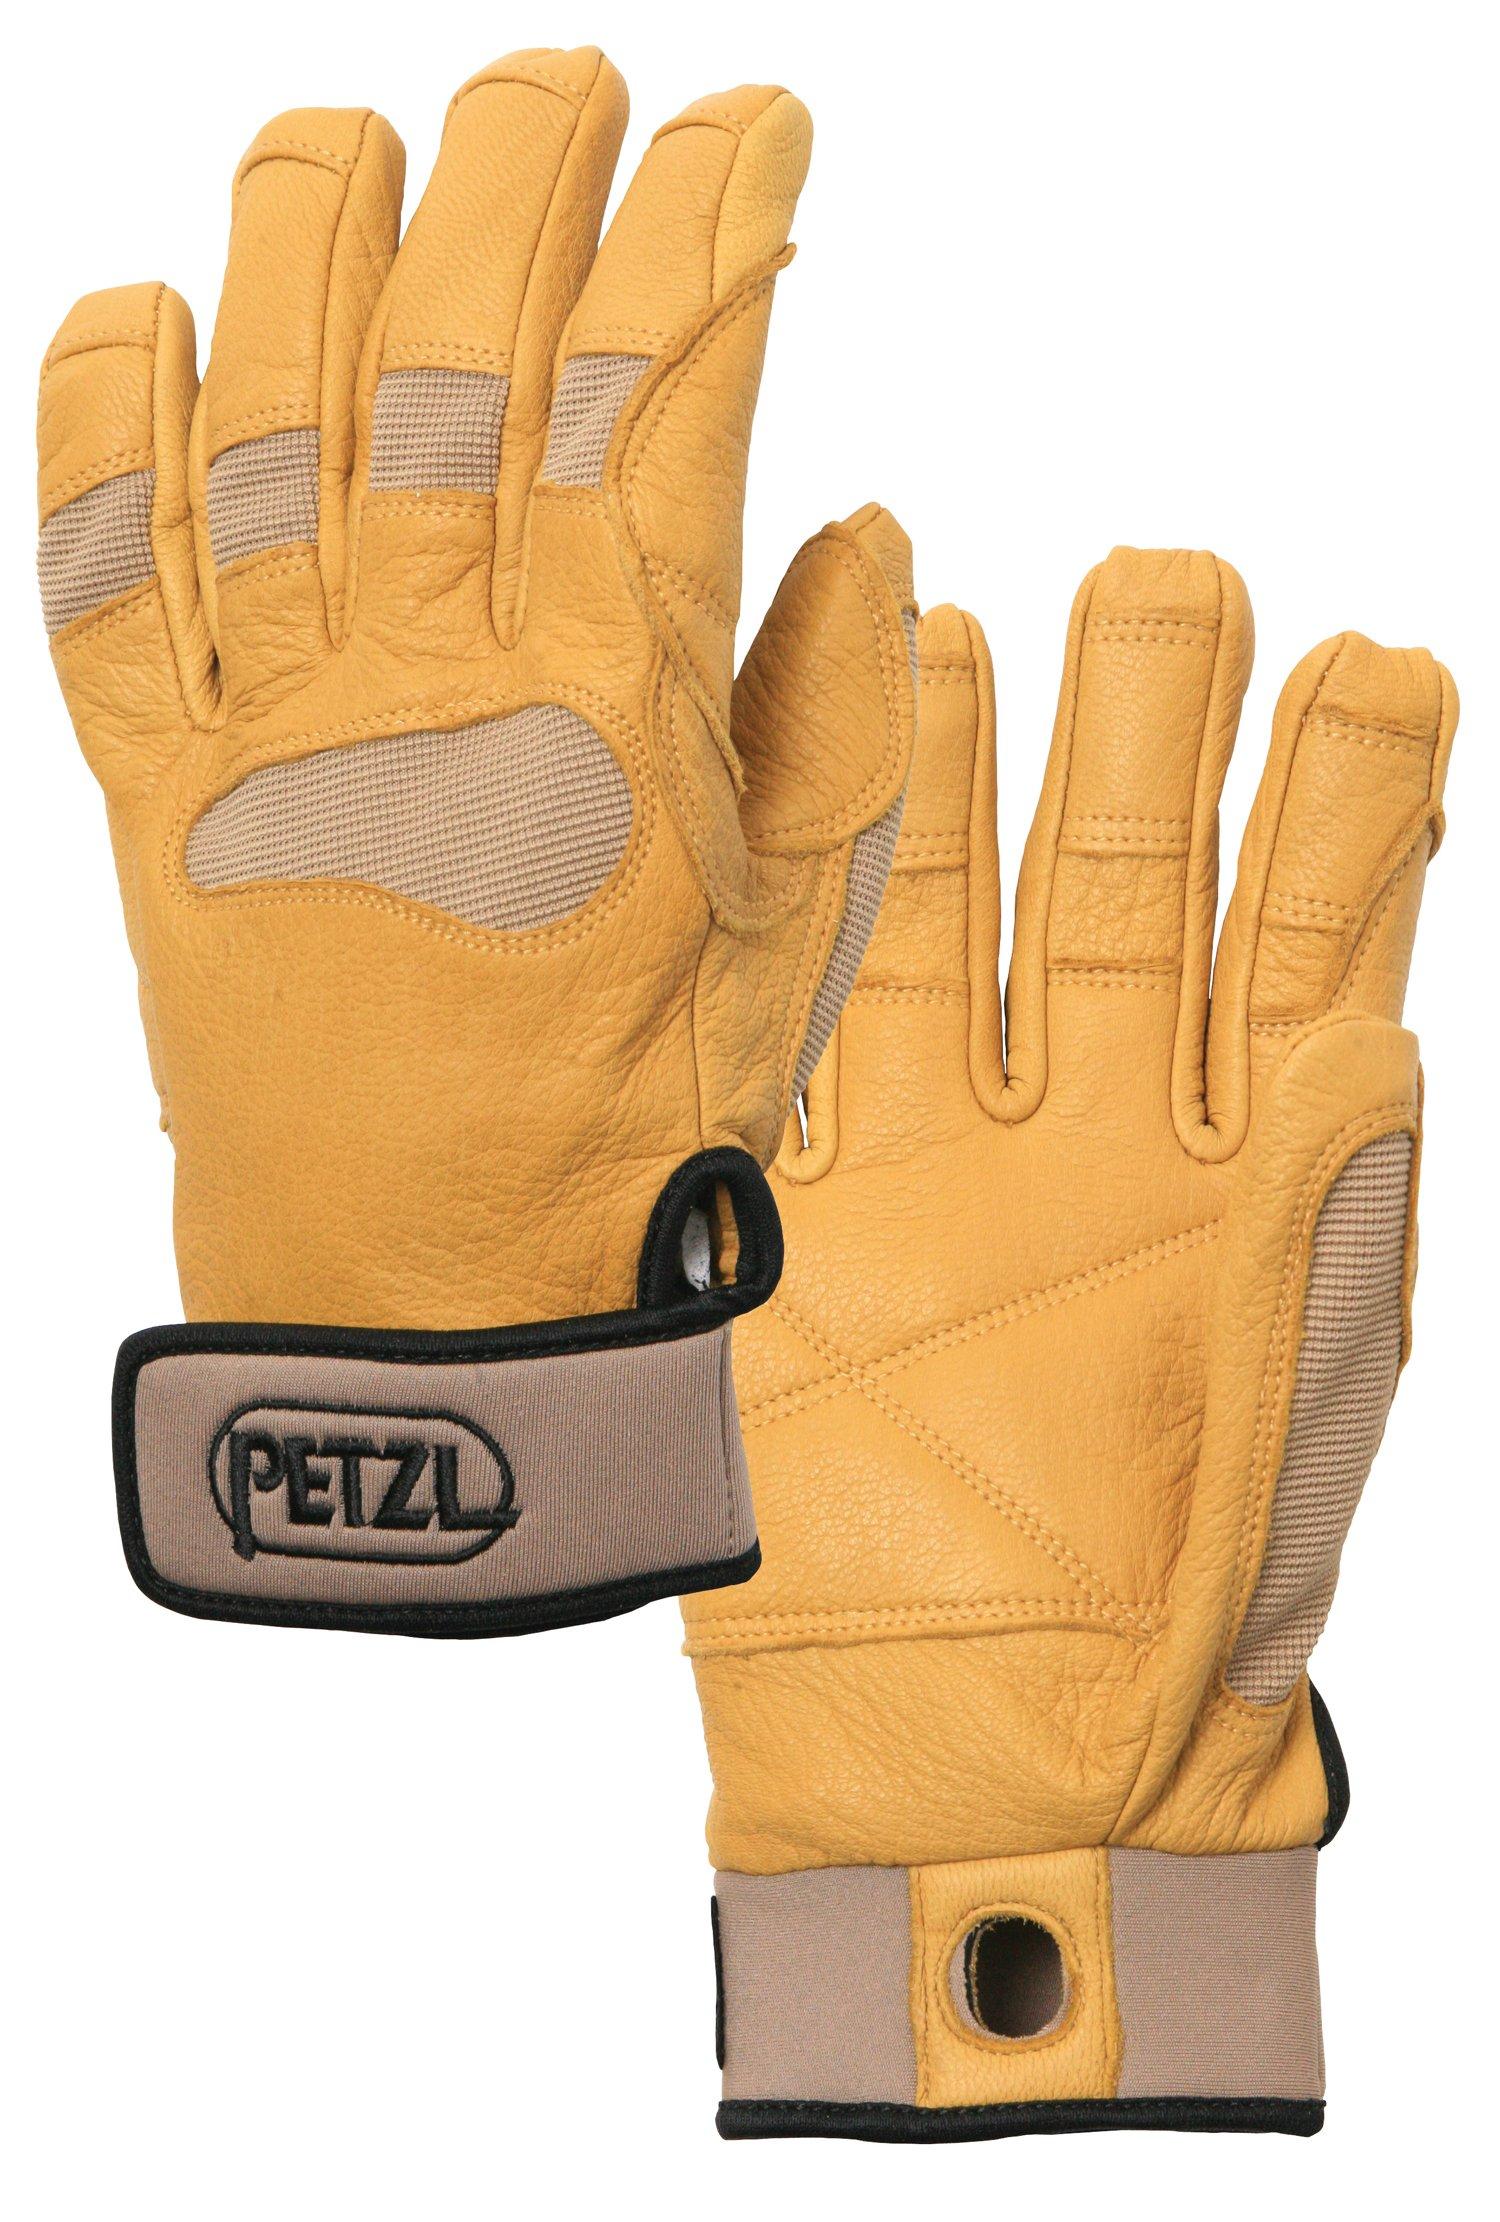 PETZL Unisex CORDEX+ Belay/Rap Glove Tan XS